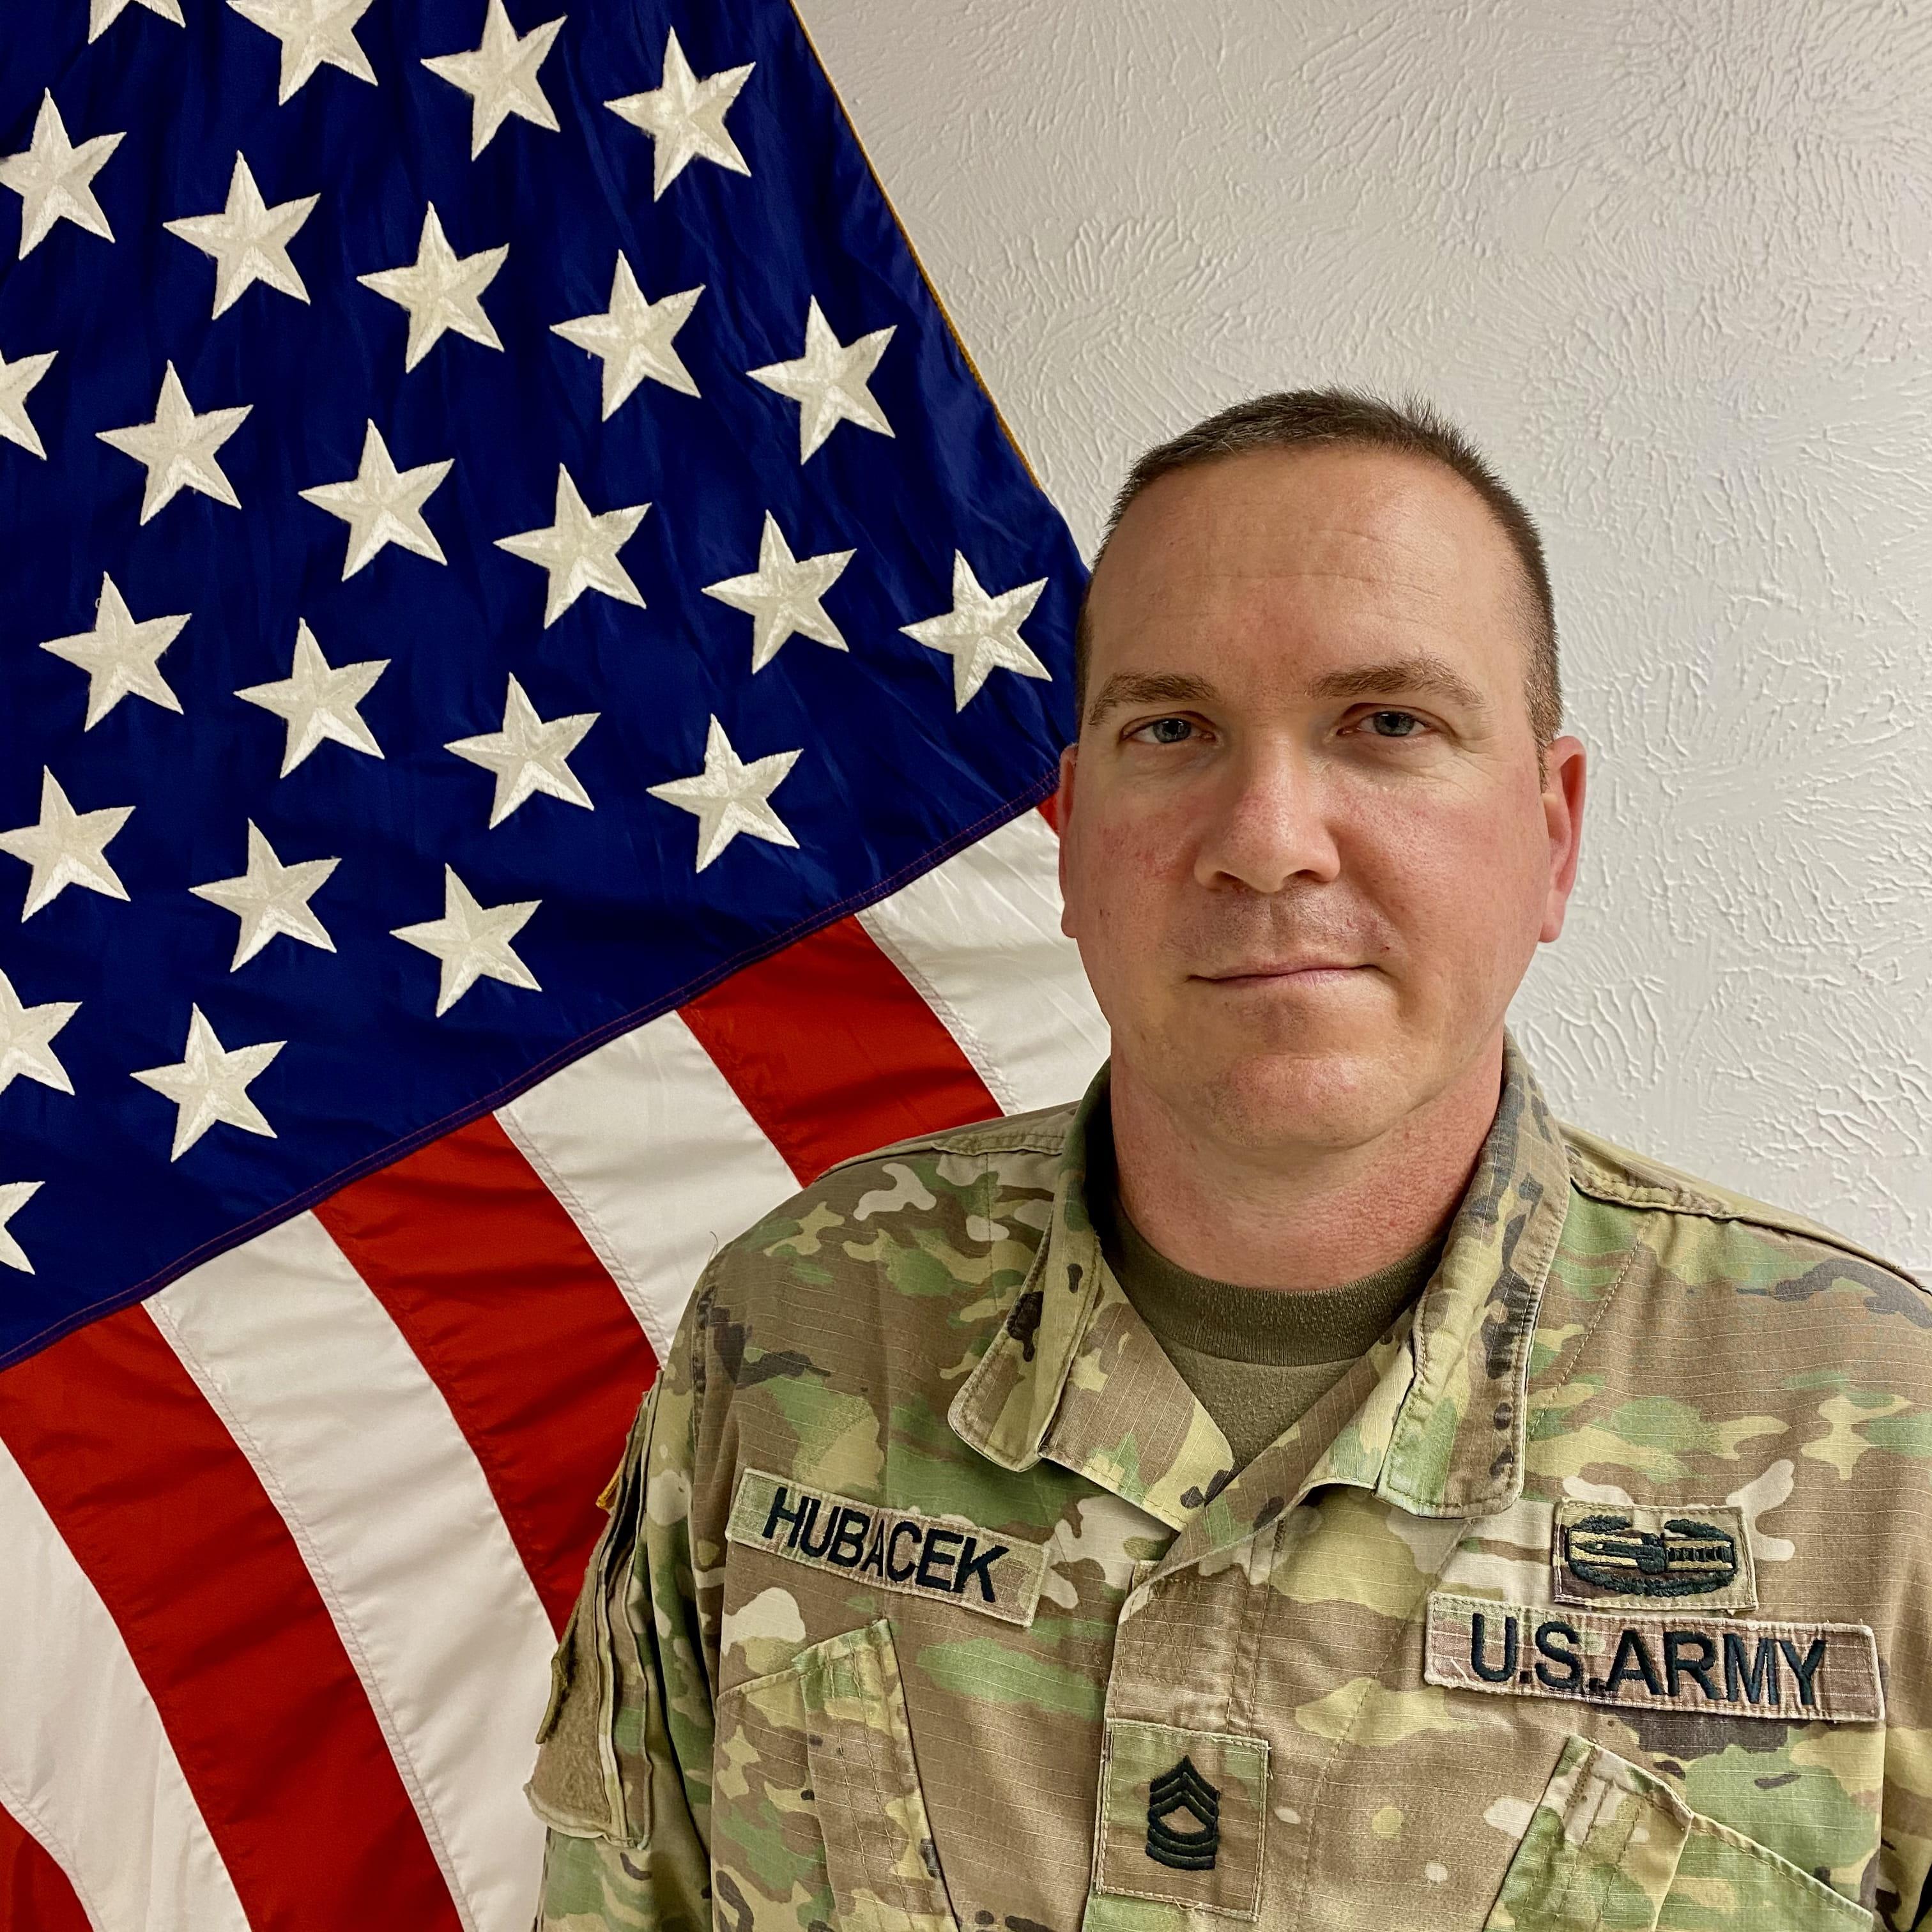 Master Sergeant Jeremy Hubacek